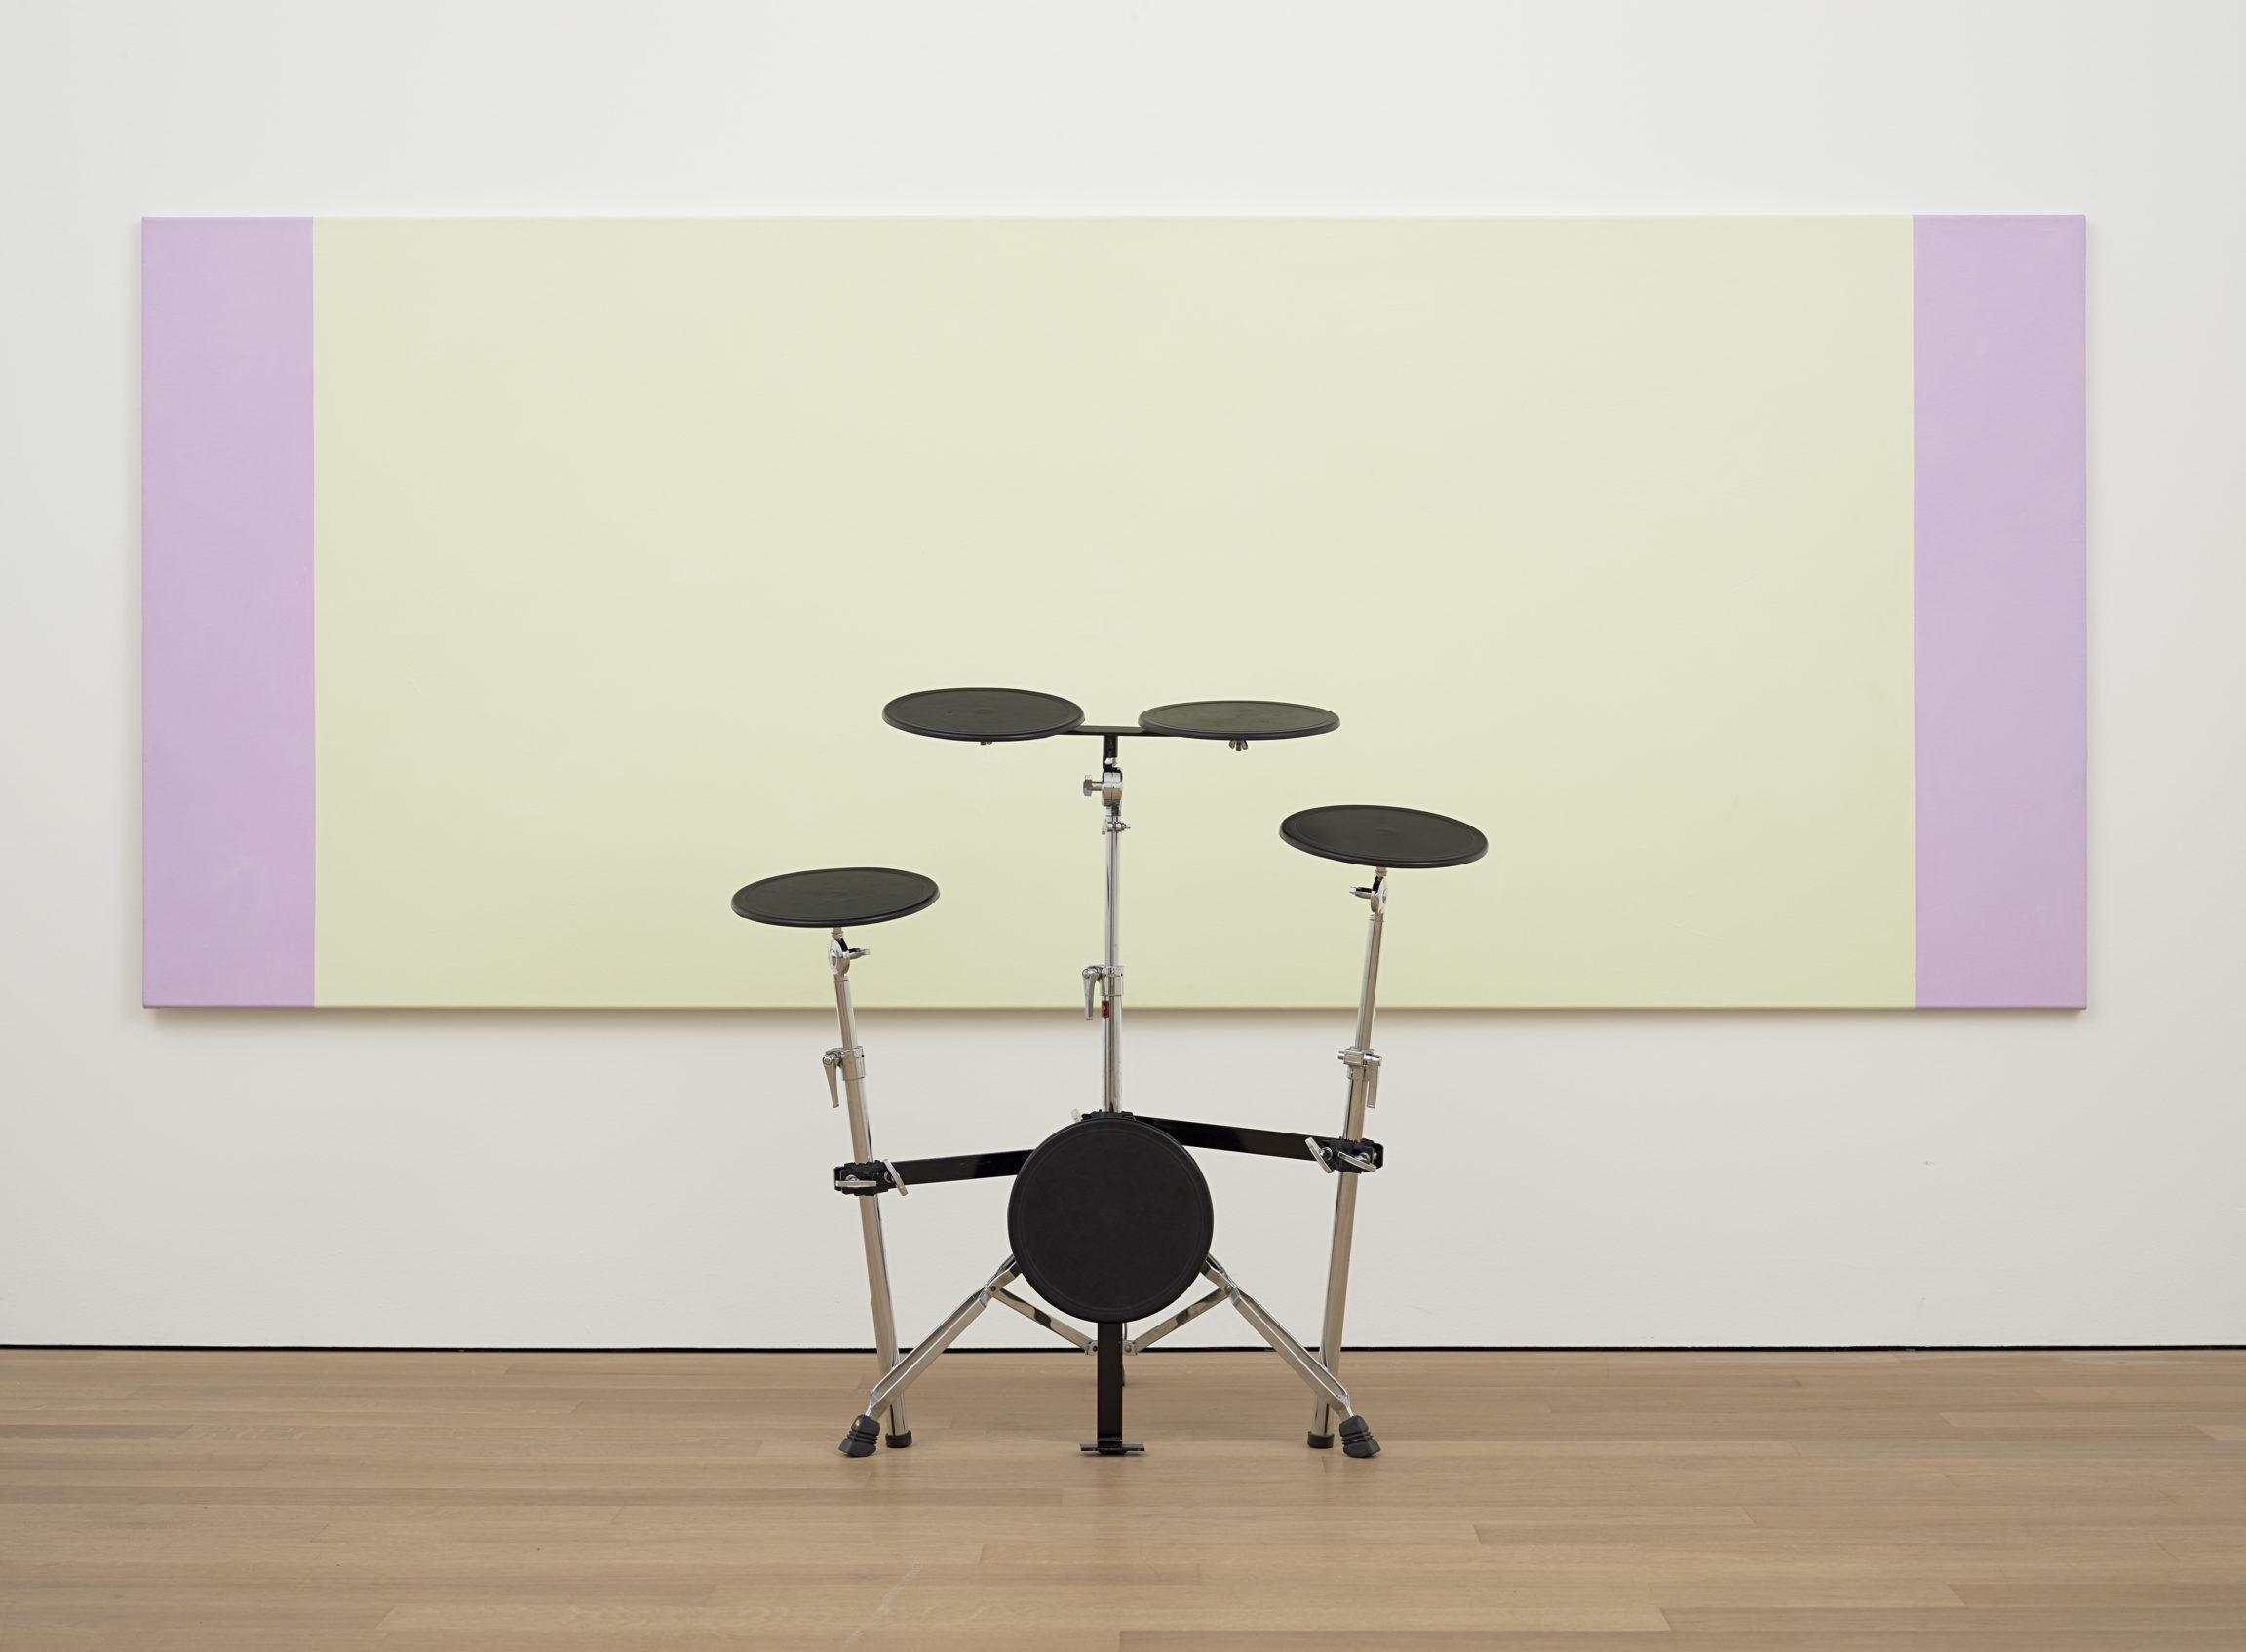 John M Armleder, Furniture Sculpture 189, 1988